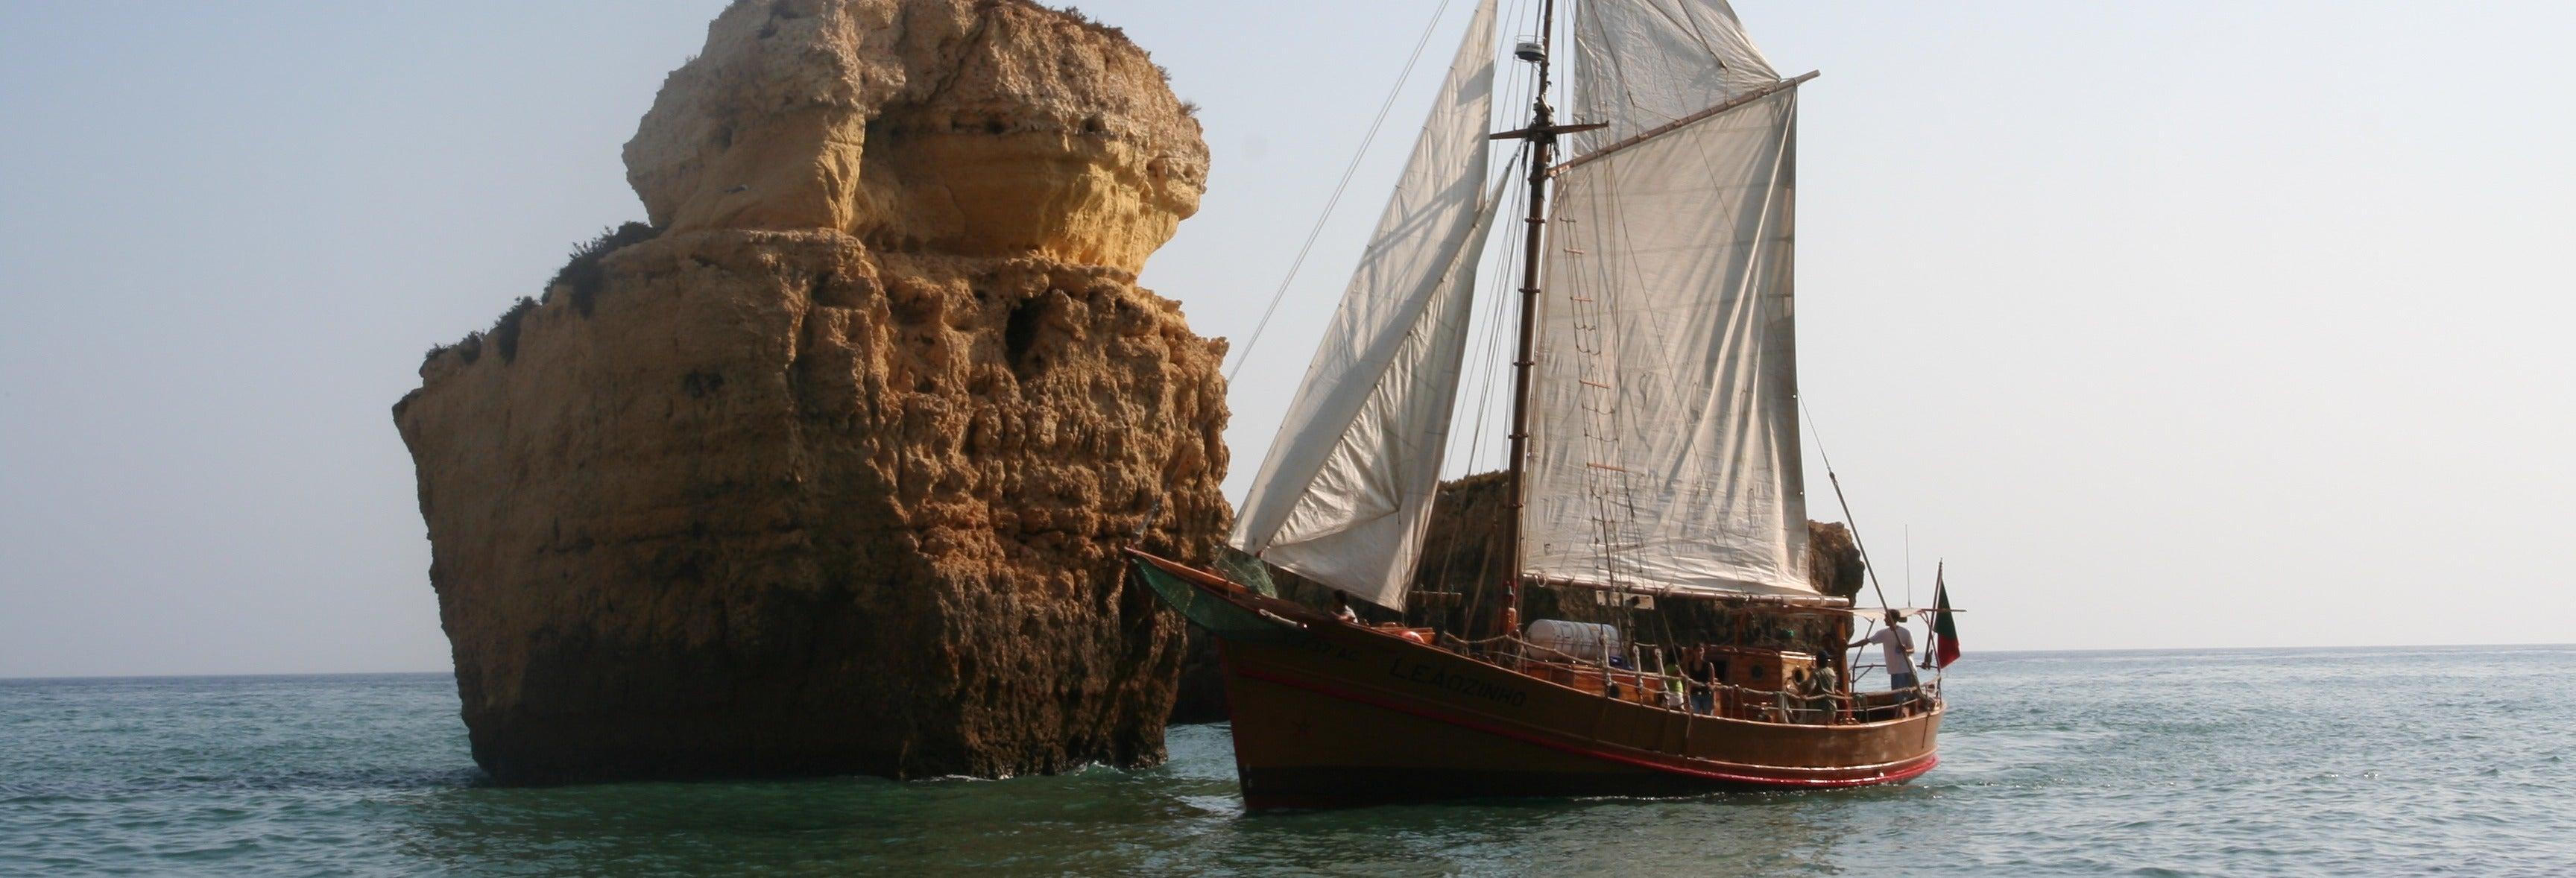 Crucero y barbacoa en barco pirata